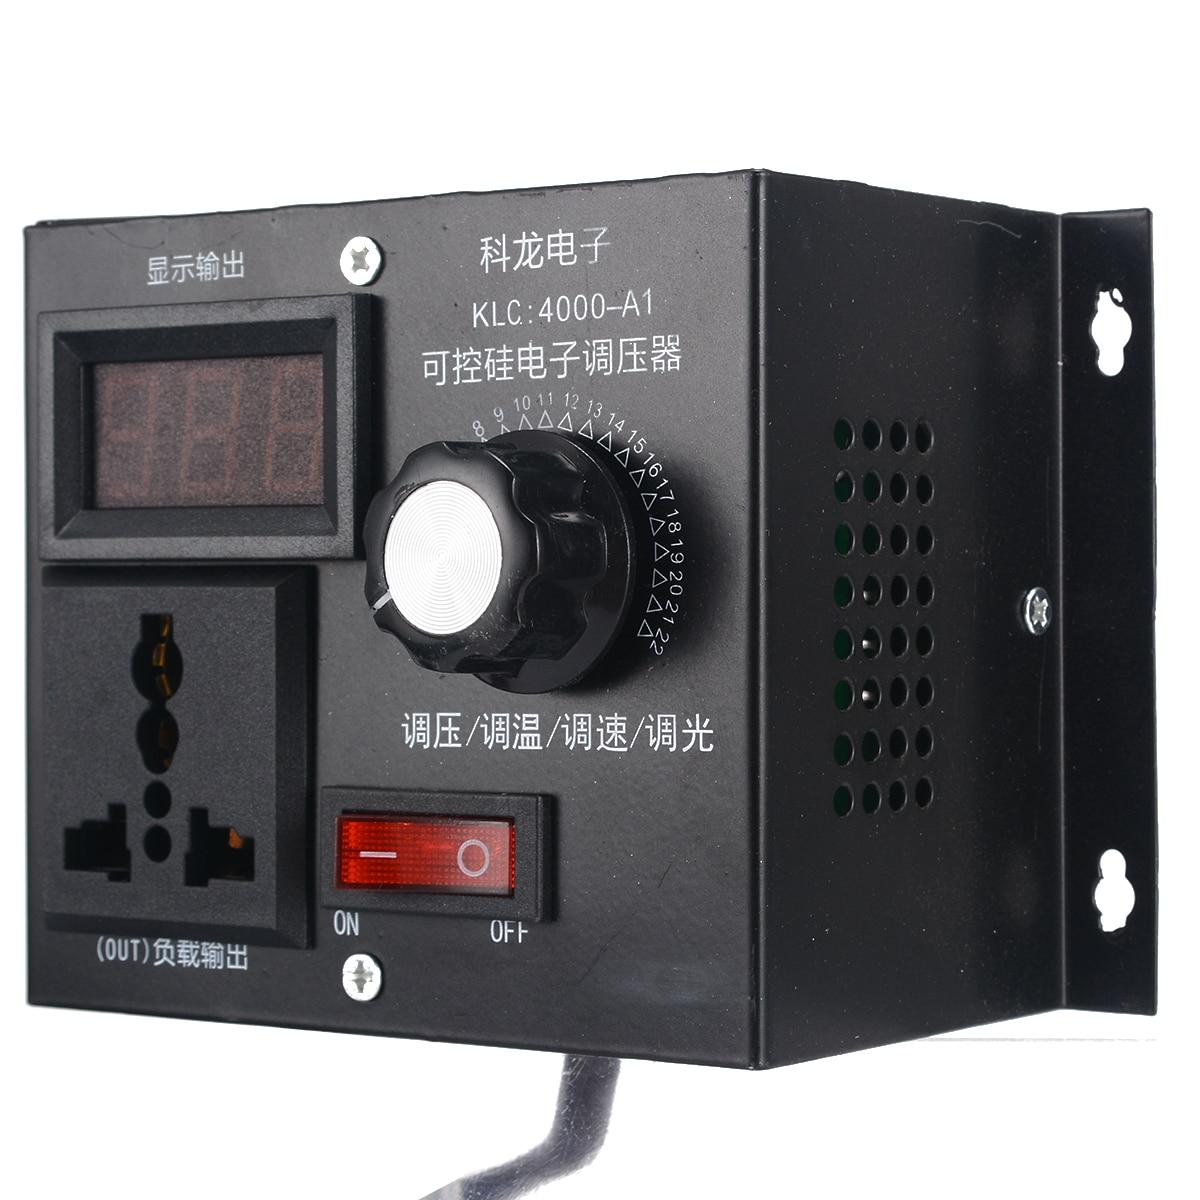 High Quality 220V 4000W Electronic Variable Voltage Controller For Fan Speed Motor Control Dimmer Voltage Regulator Adjustment